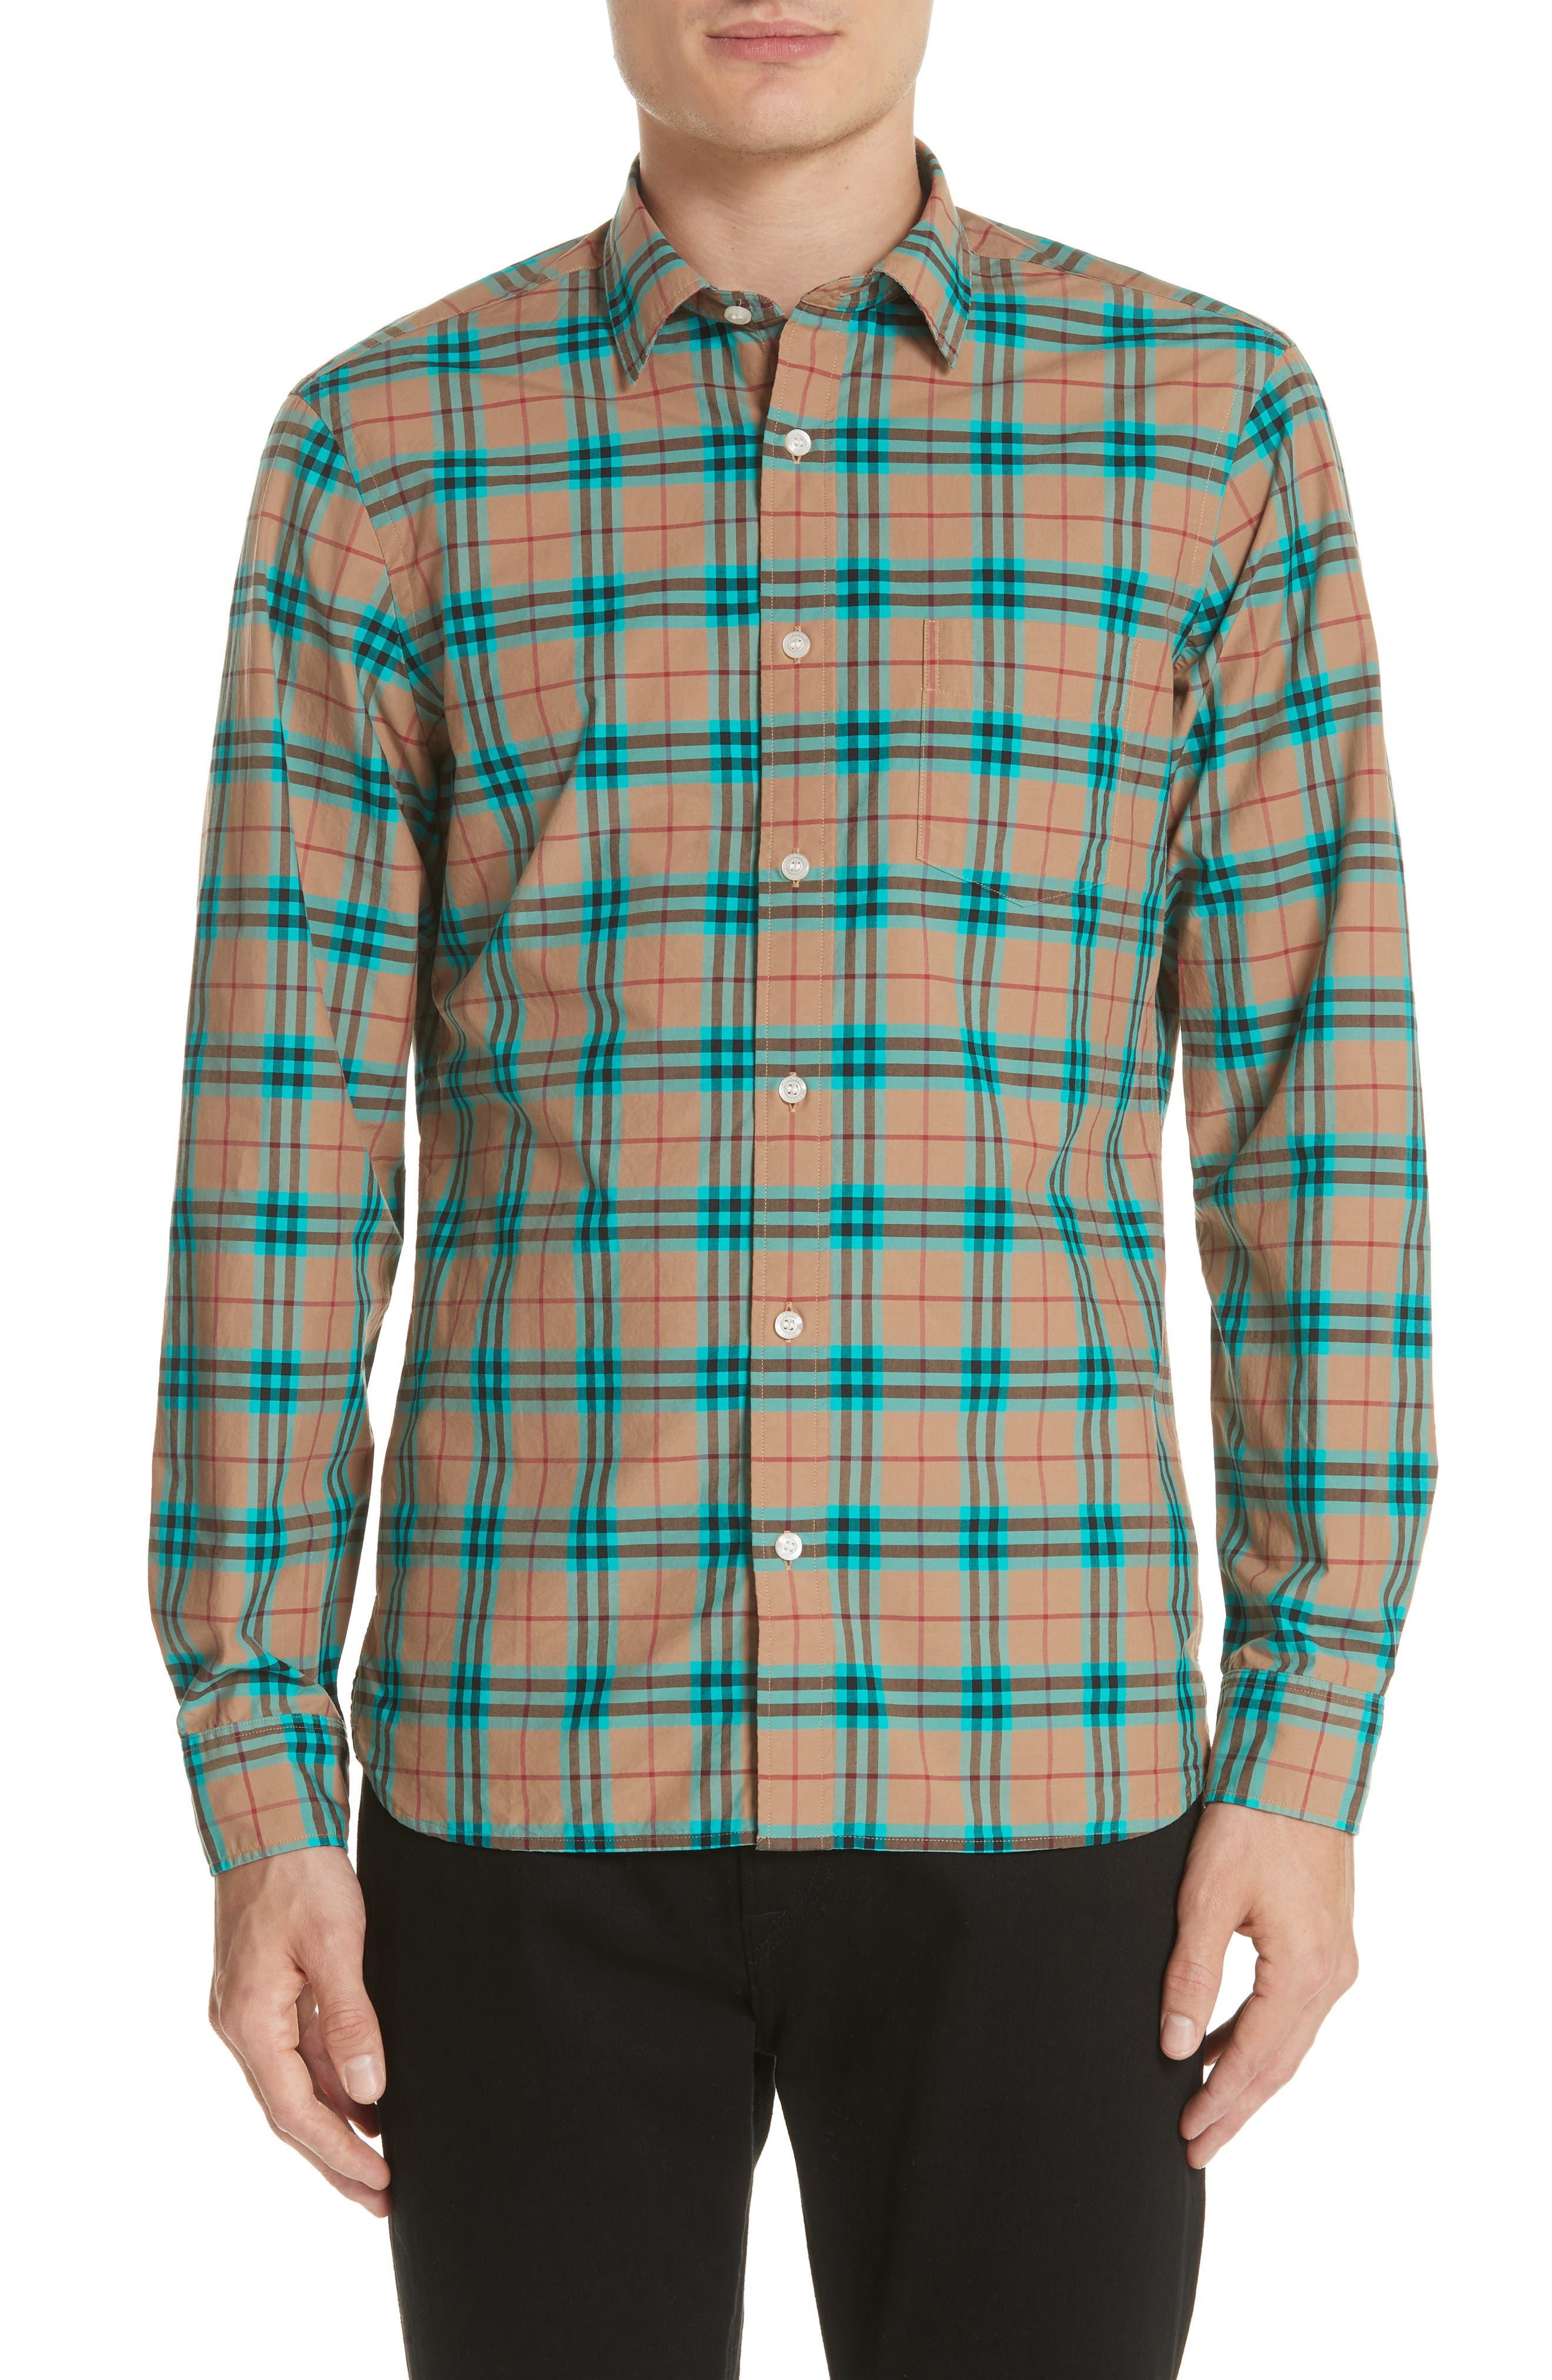 Alexander Check Sport Shirt,                             Main thumbnail 1, color,                             Aqua Green